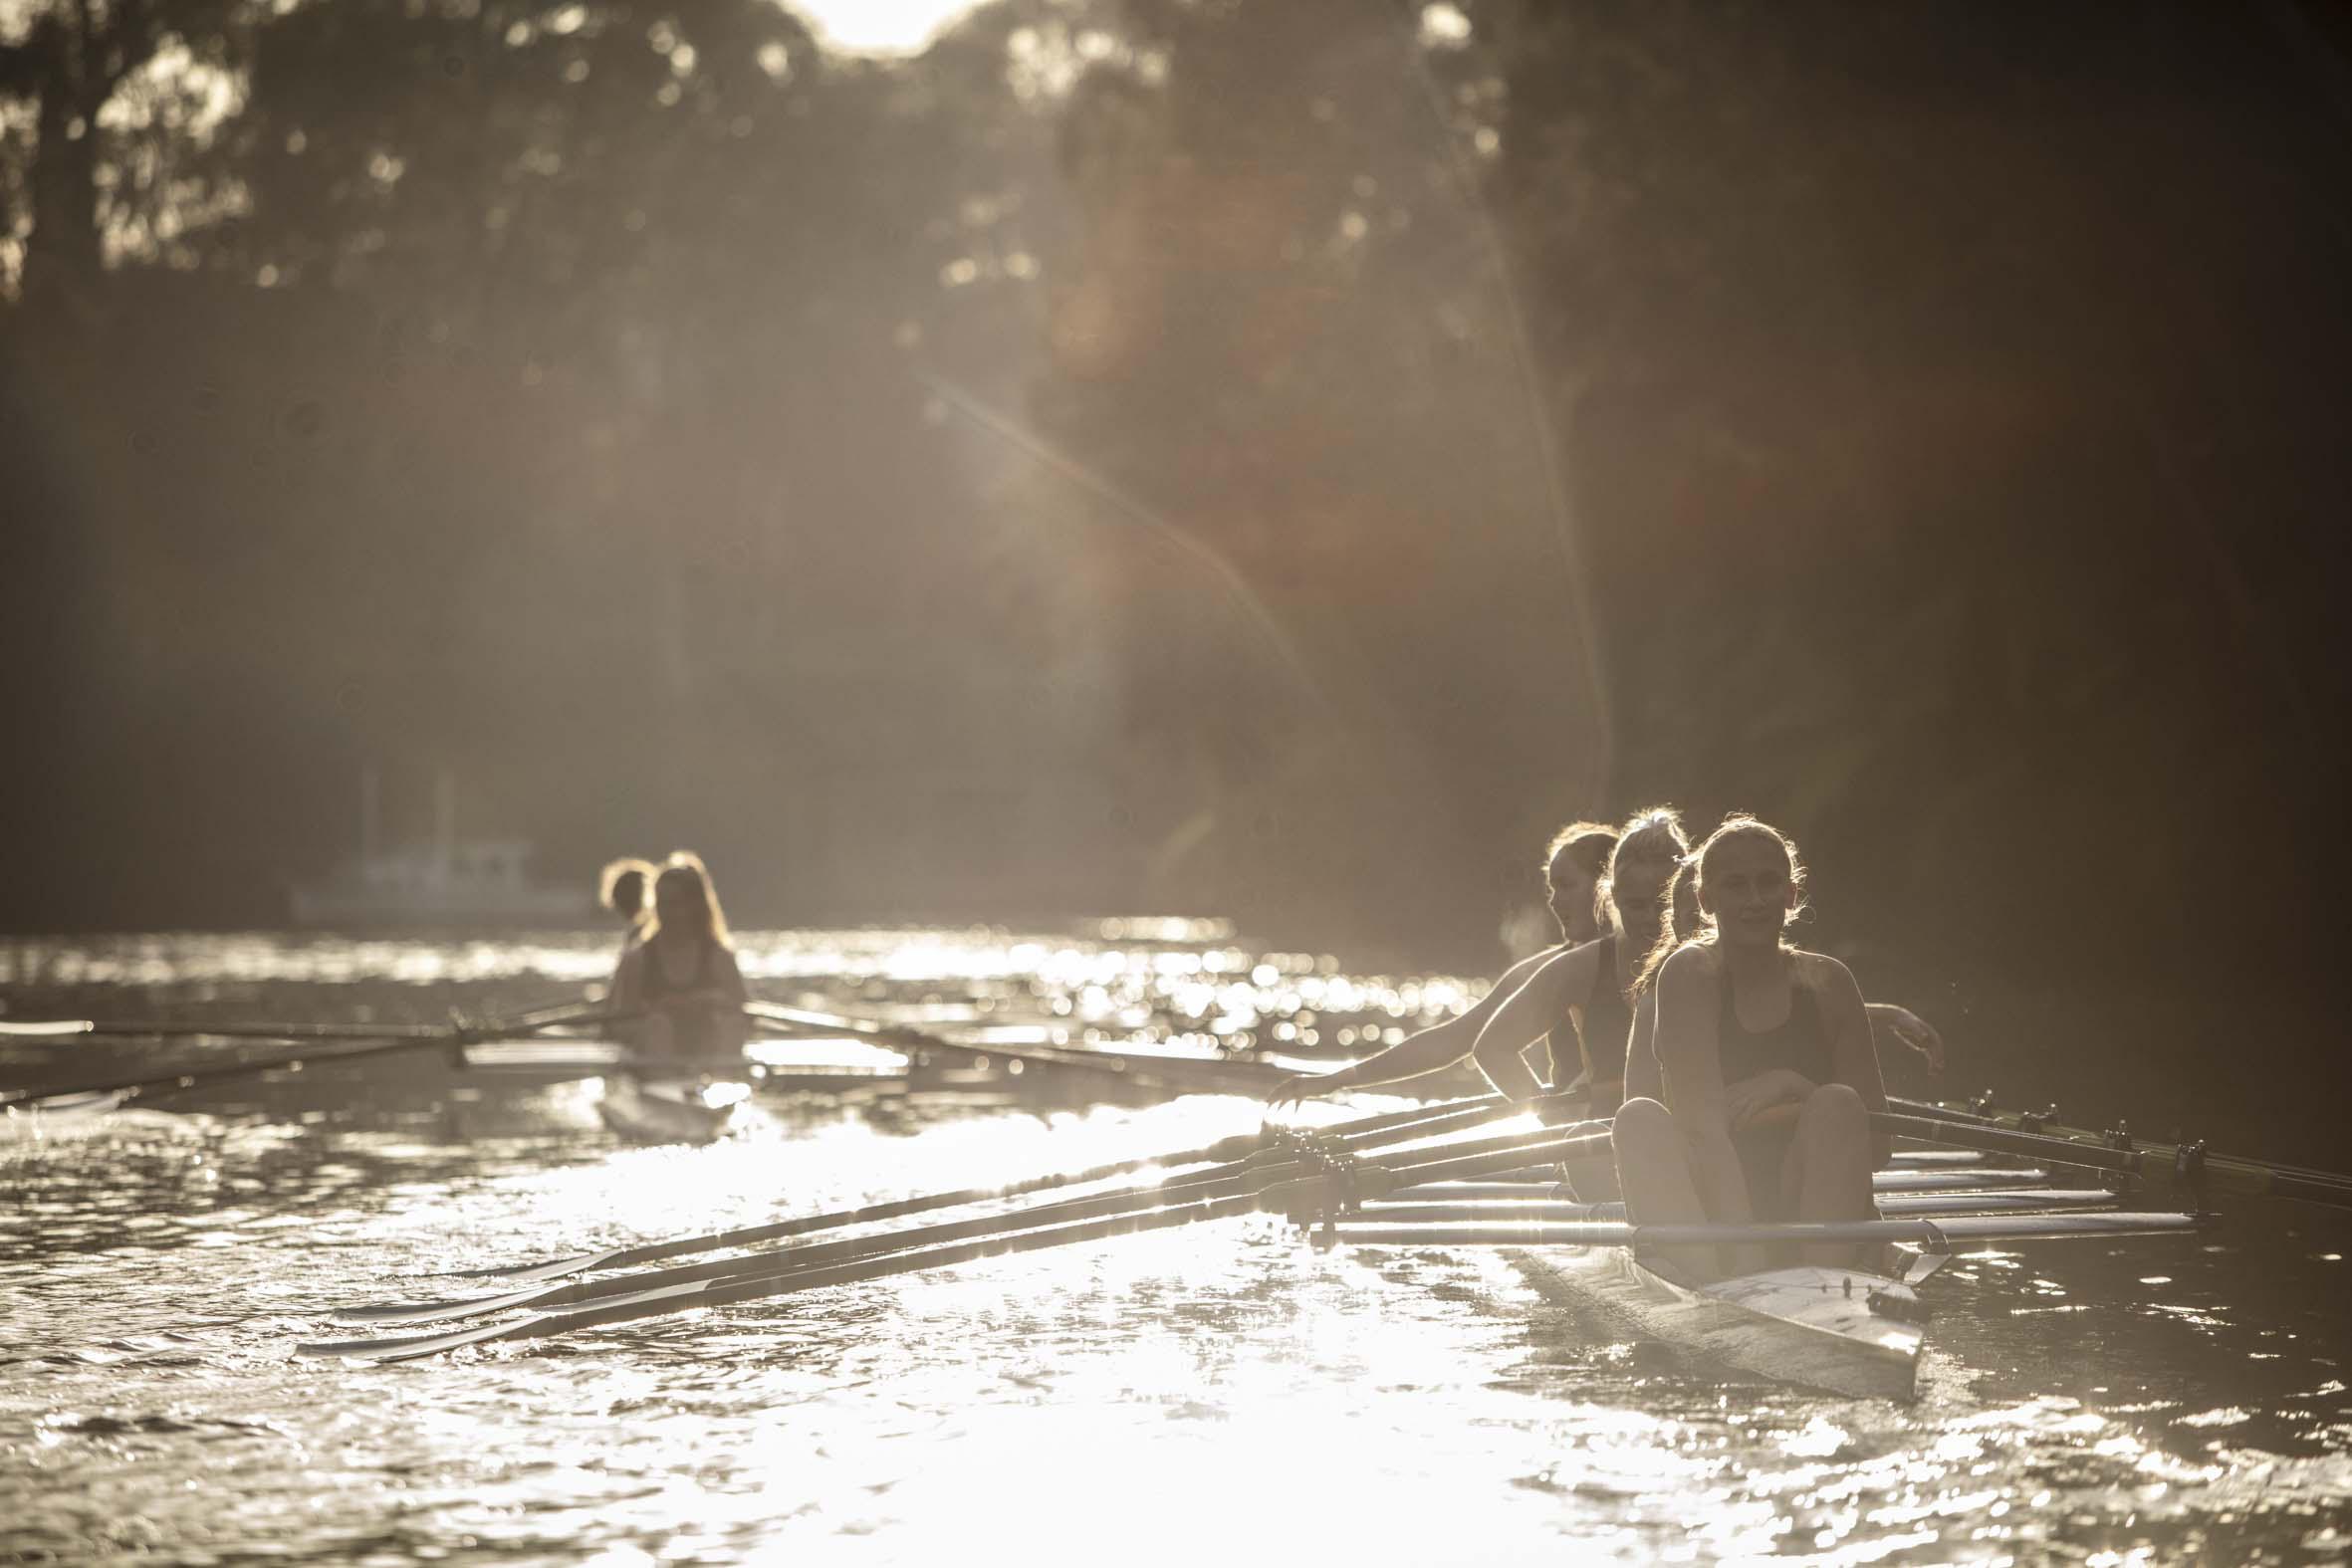 Tay Creggan Rowing